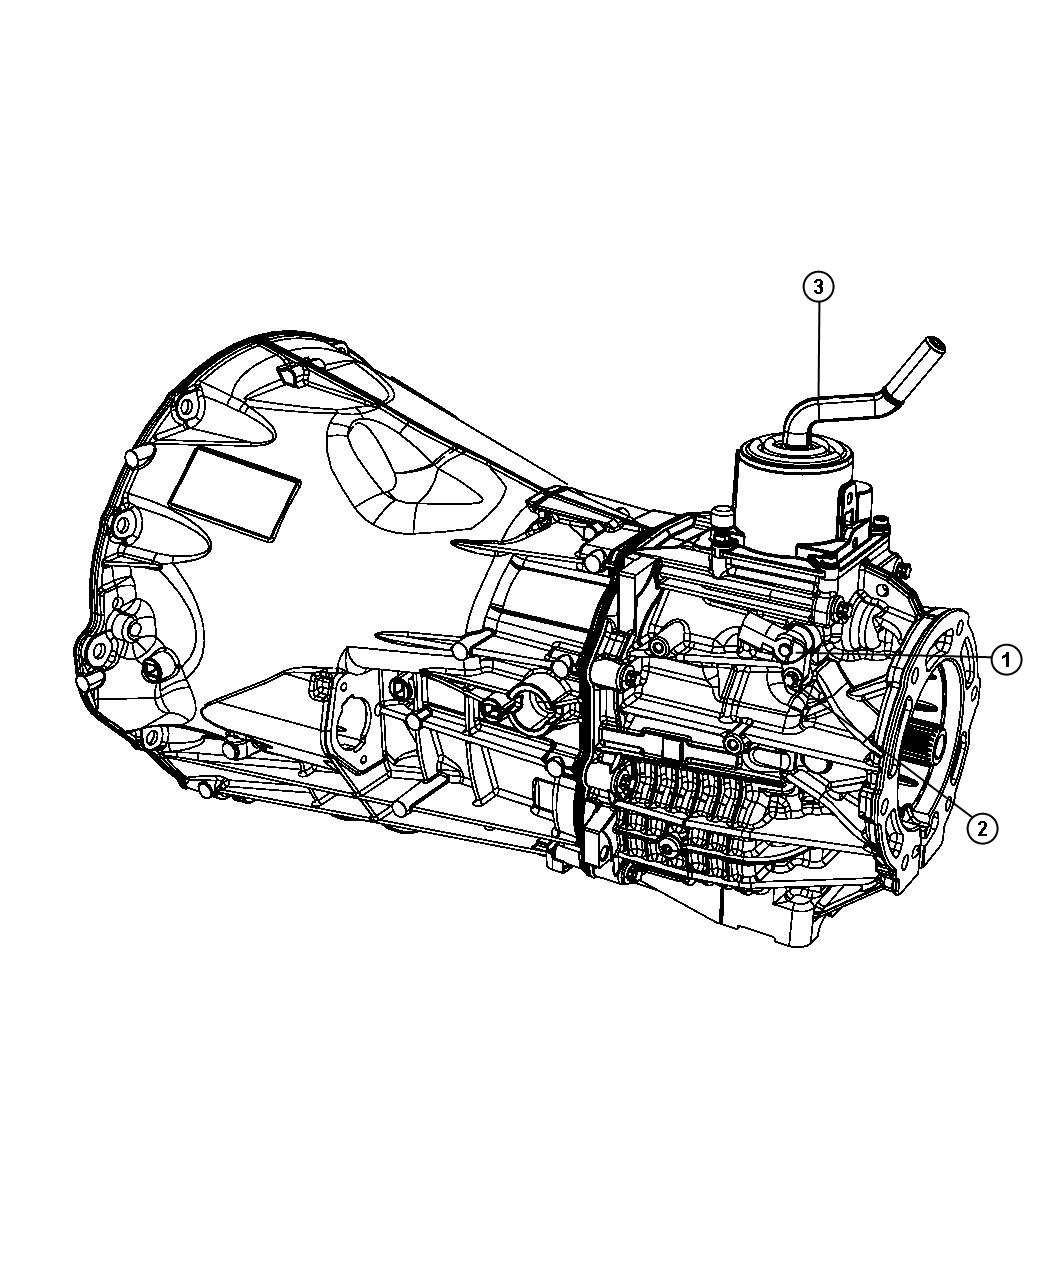 Dodge NITRO Shifter. Tower. Case, transmission, transfer